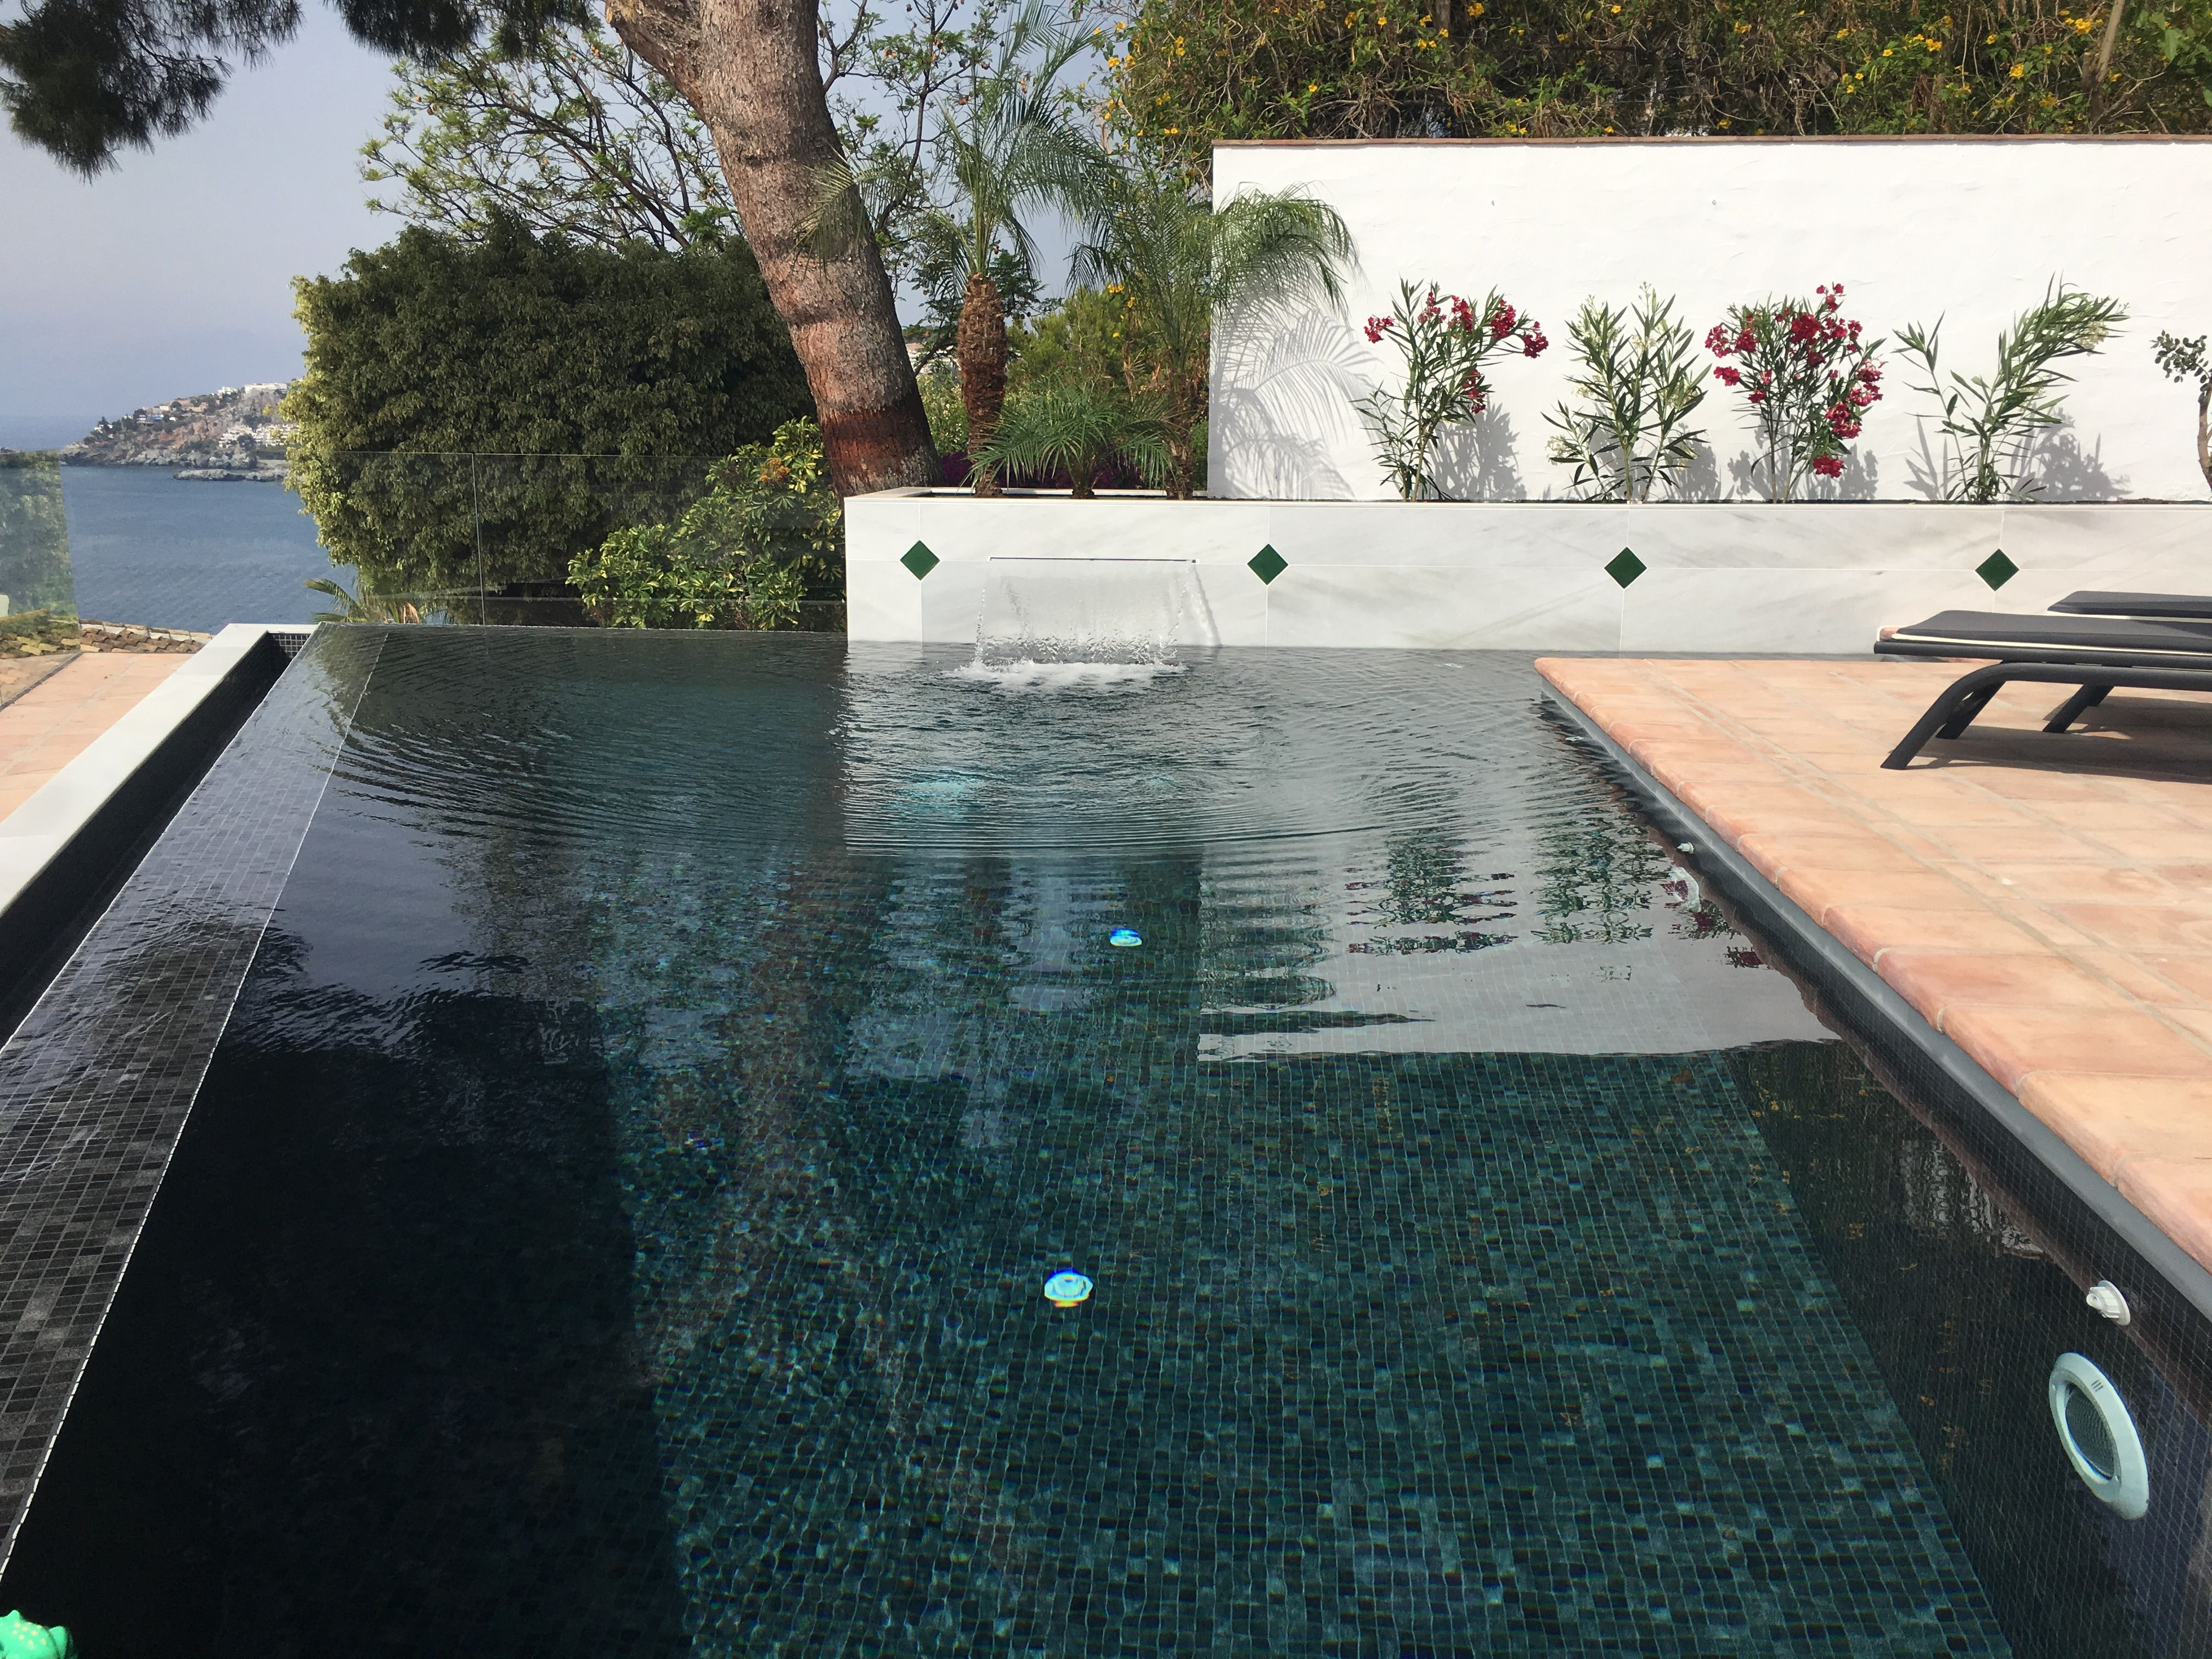 Piscina De Borde Rebosante Con Gresite Negro Infinity Pool With Black Tiles